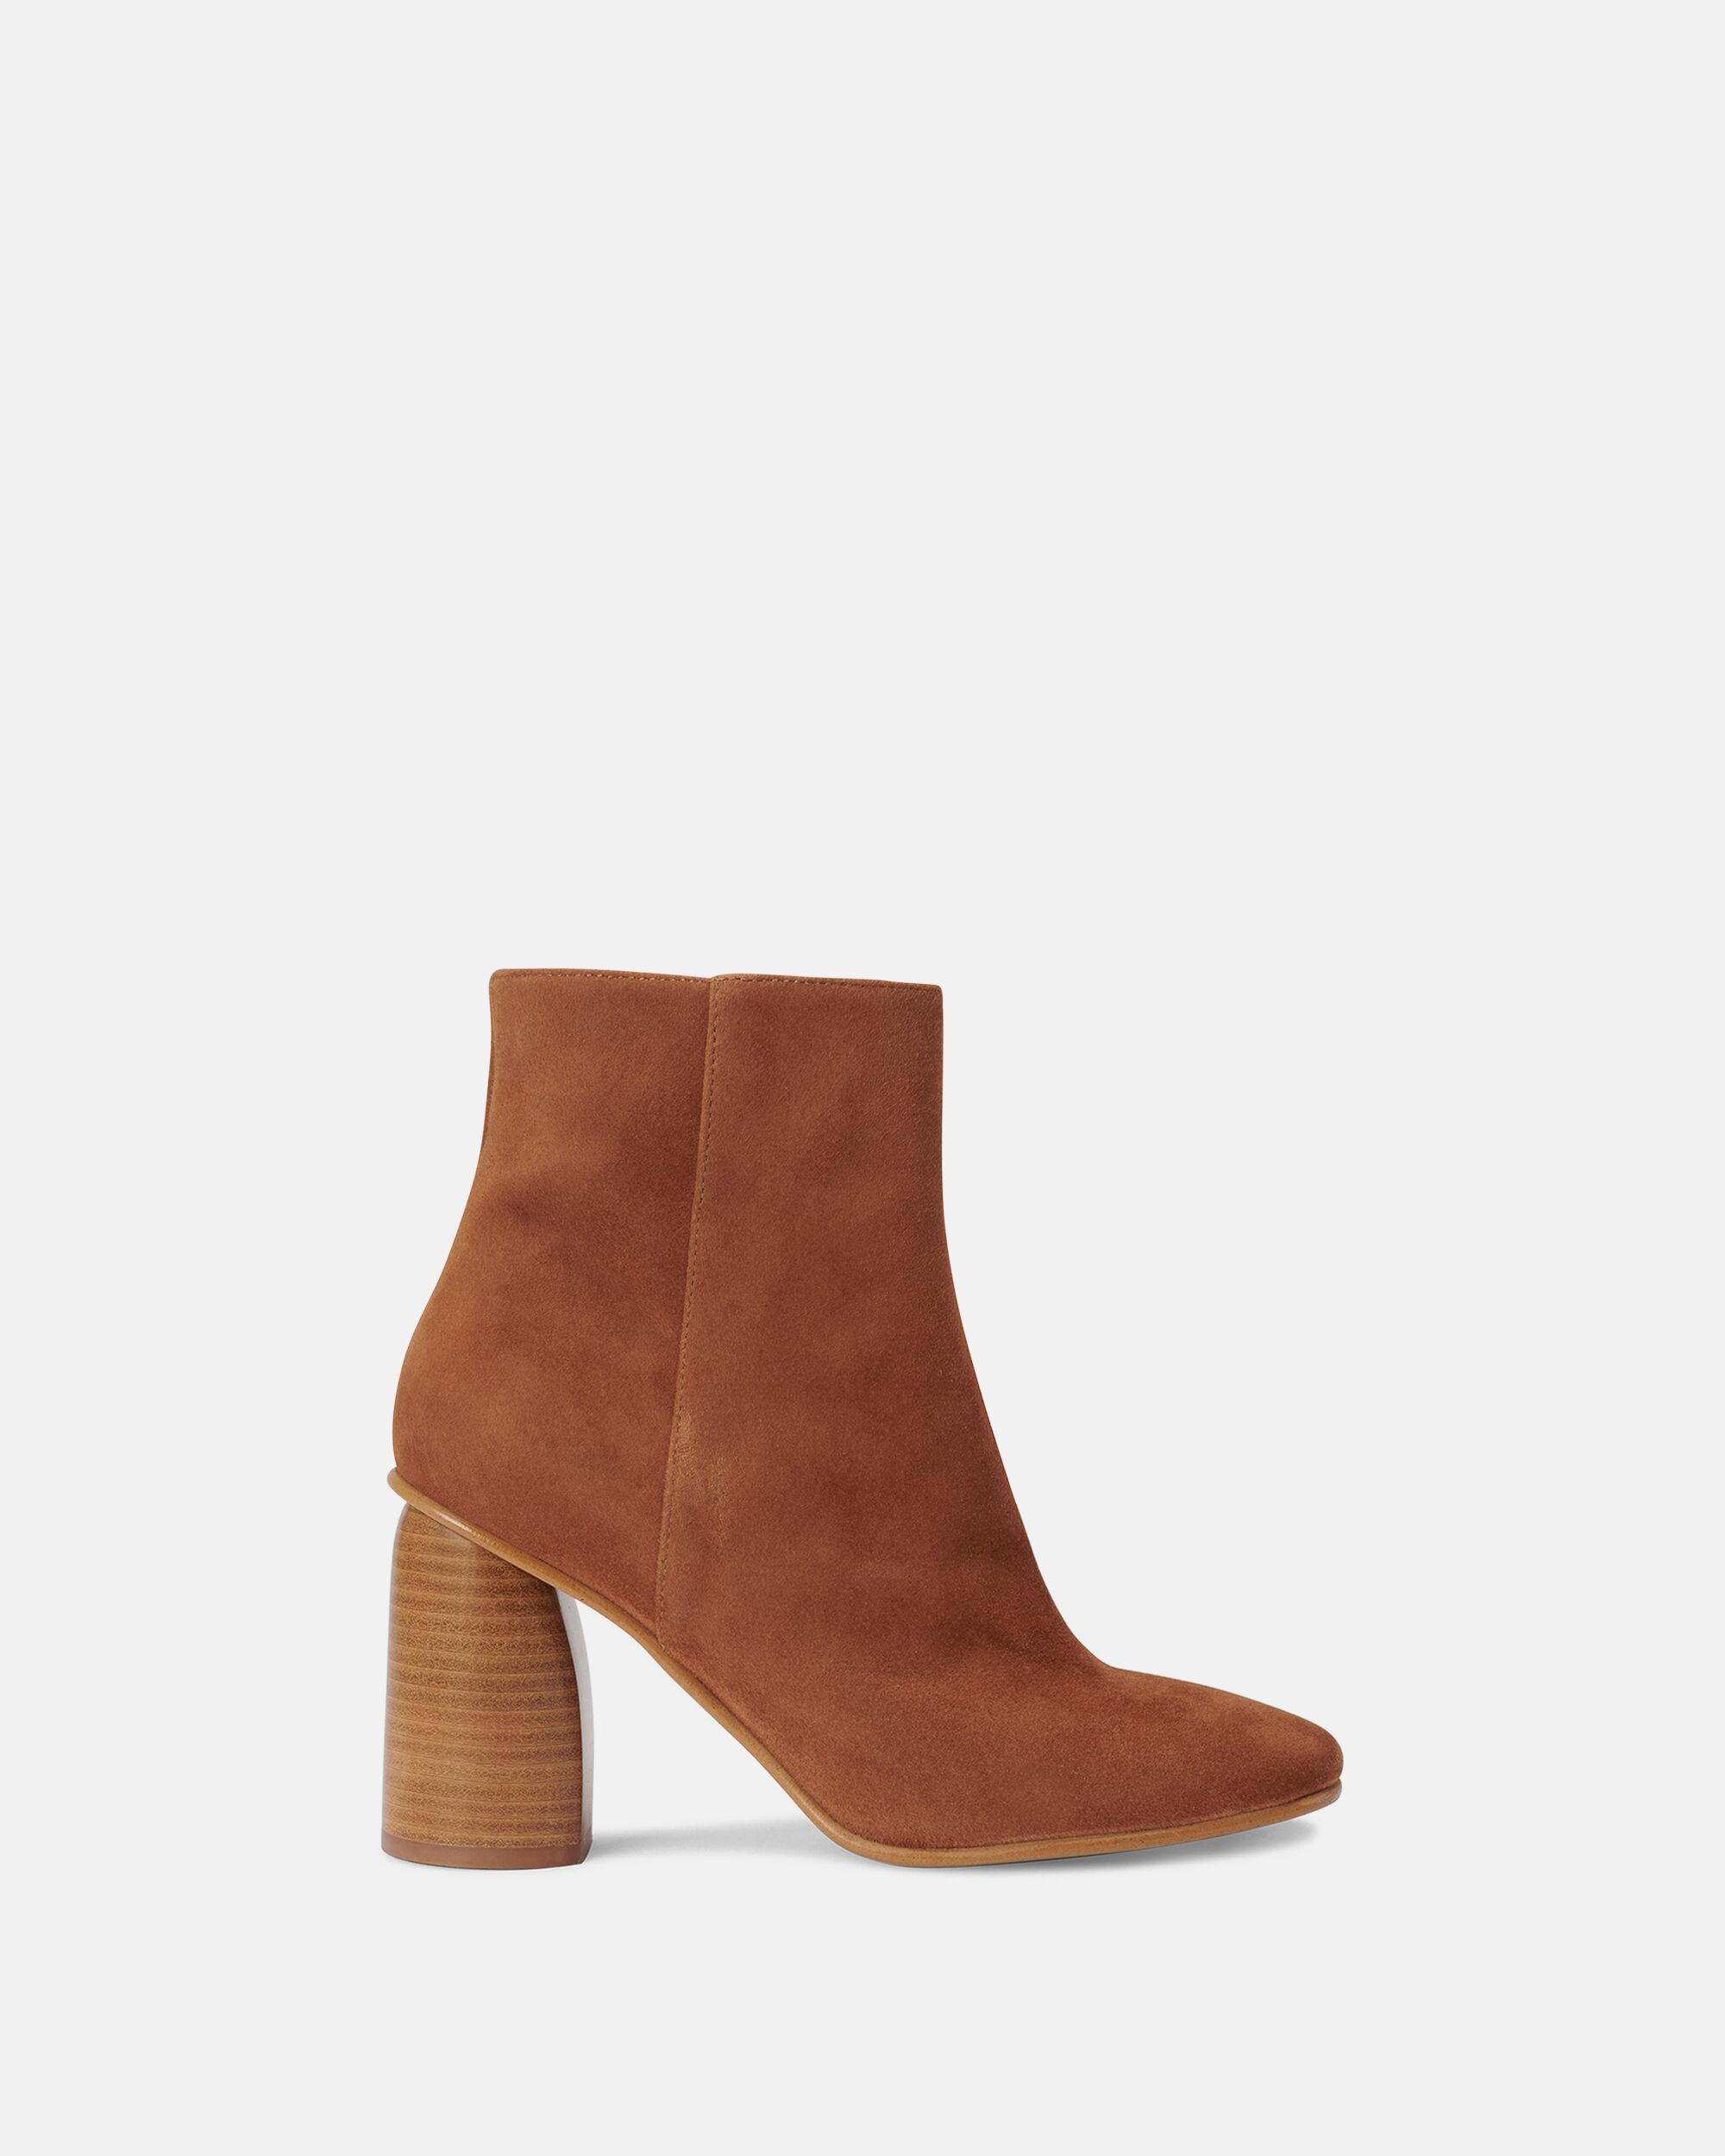 BottinesCuir – Chelsea Femme Minelli Boots c4qS35RLAj